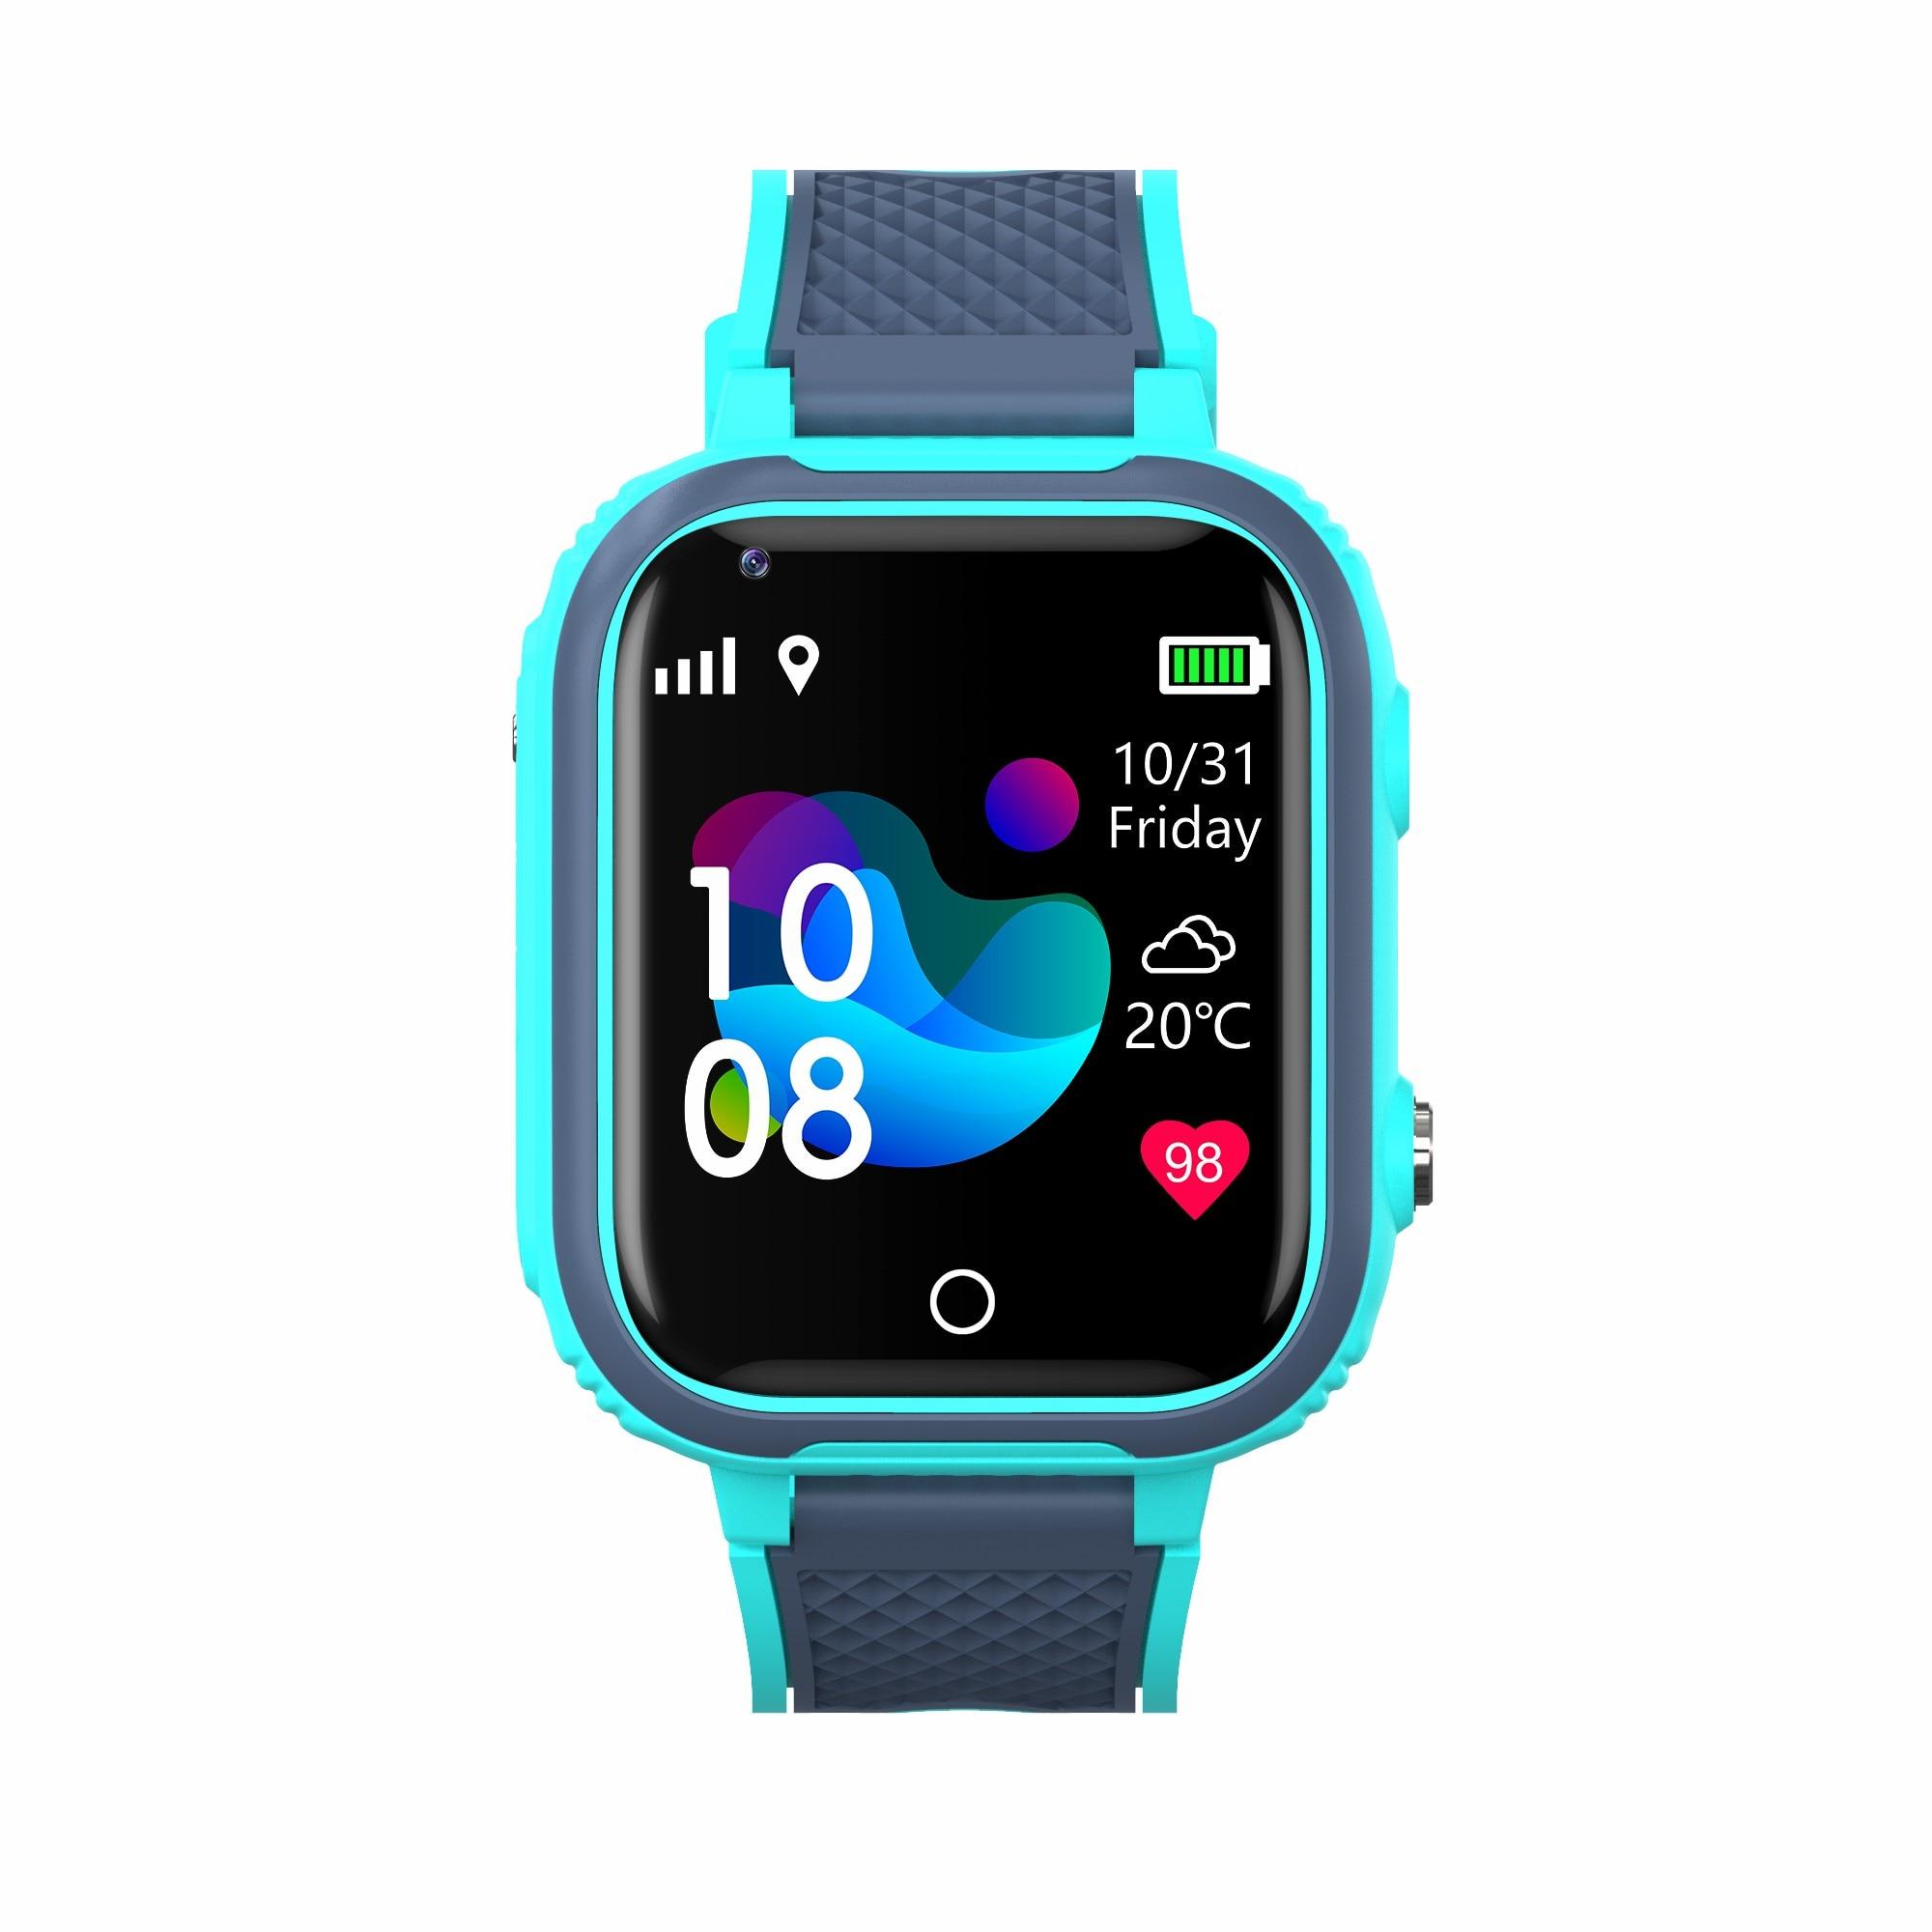 H4c1d620090394c7f90ad4696ee09a8c3W LT21 4G Smart Watch Kids GPS WIFI Video Call SOS IP67 Waterproof Child Smartwatch Camera Monitor Tracker Location Phone Watch